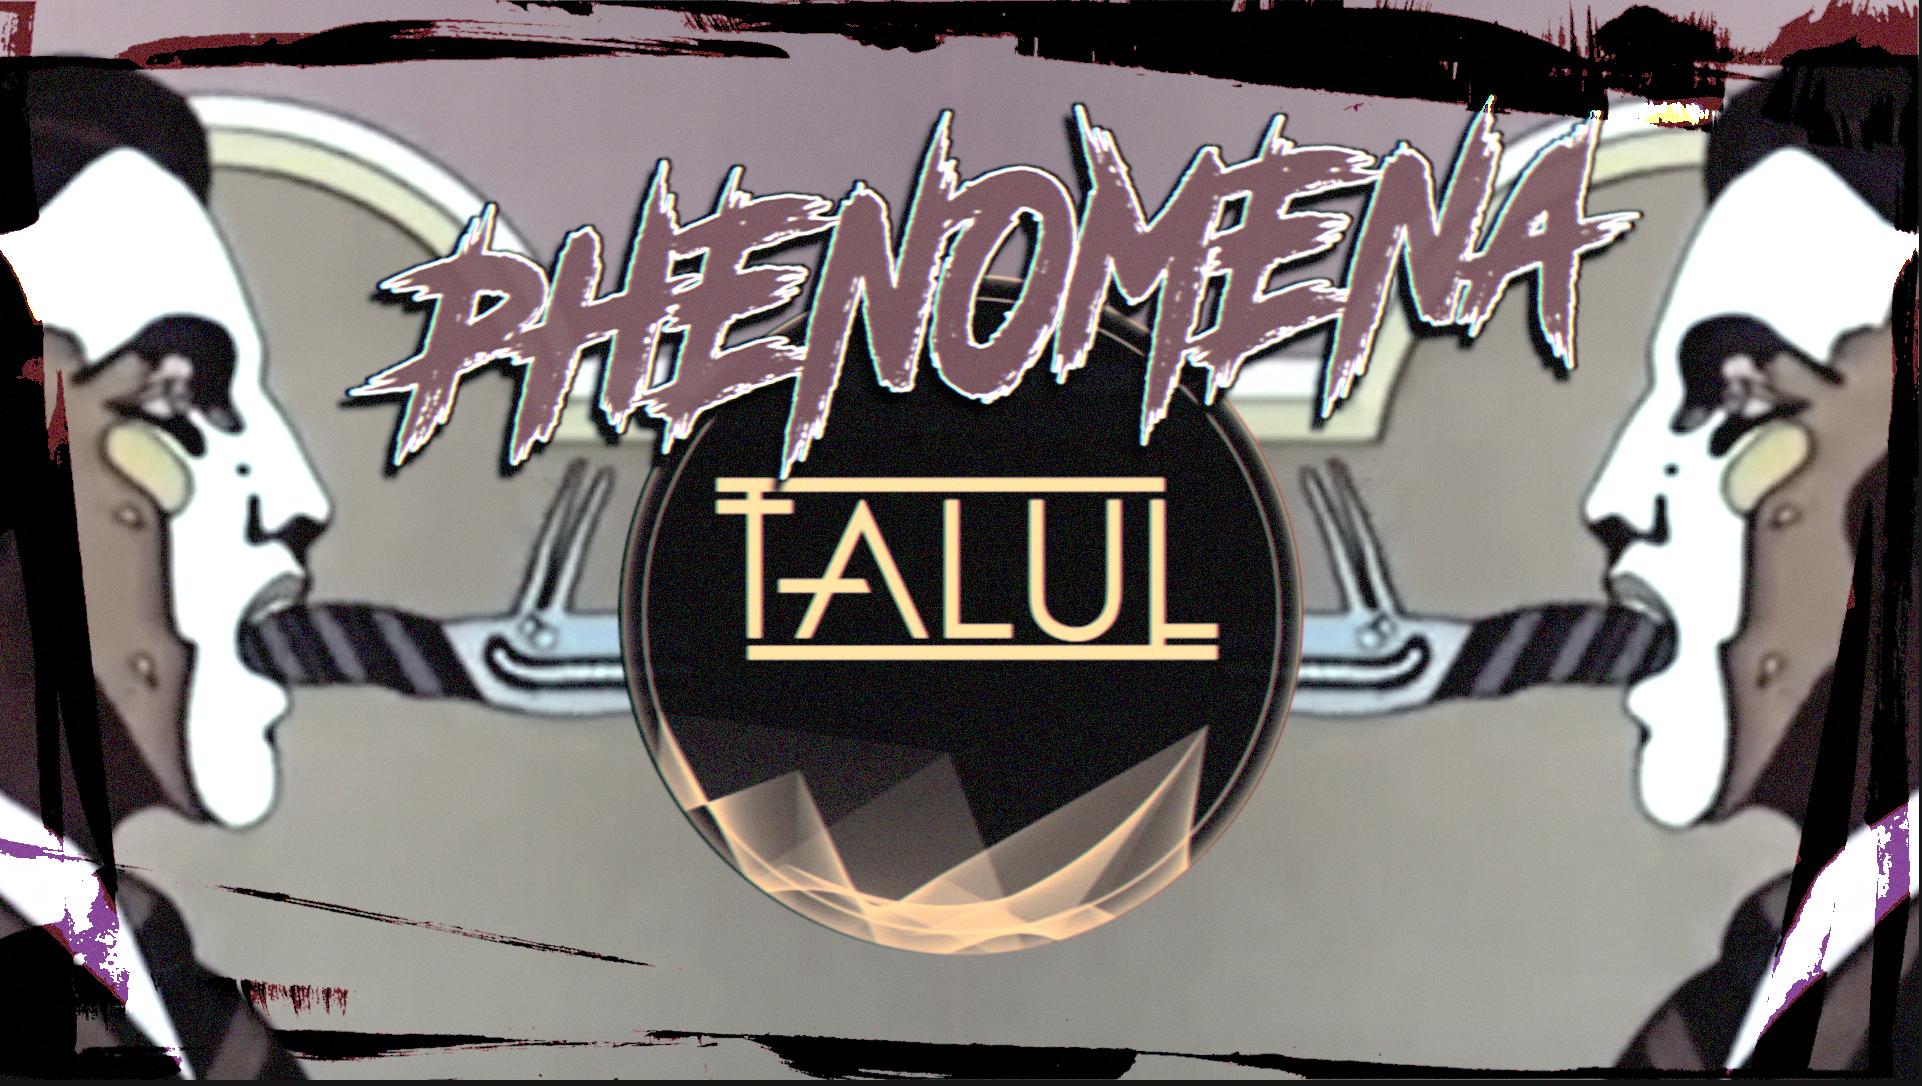 Phenomena mit Talul & Oovation Live